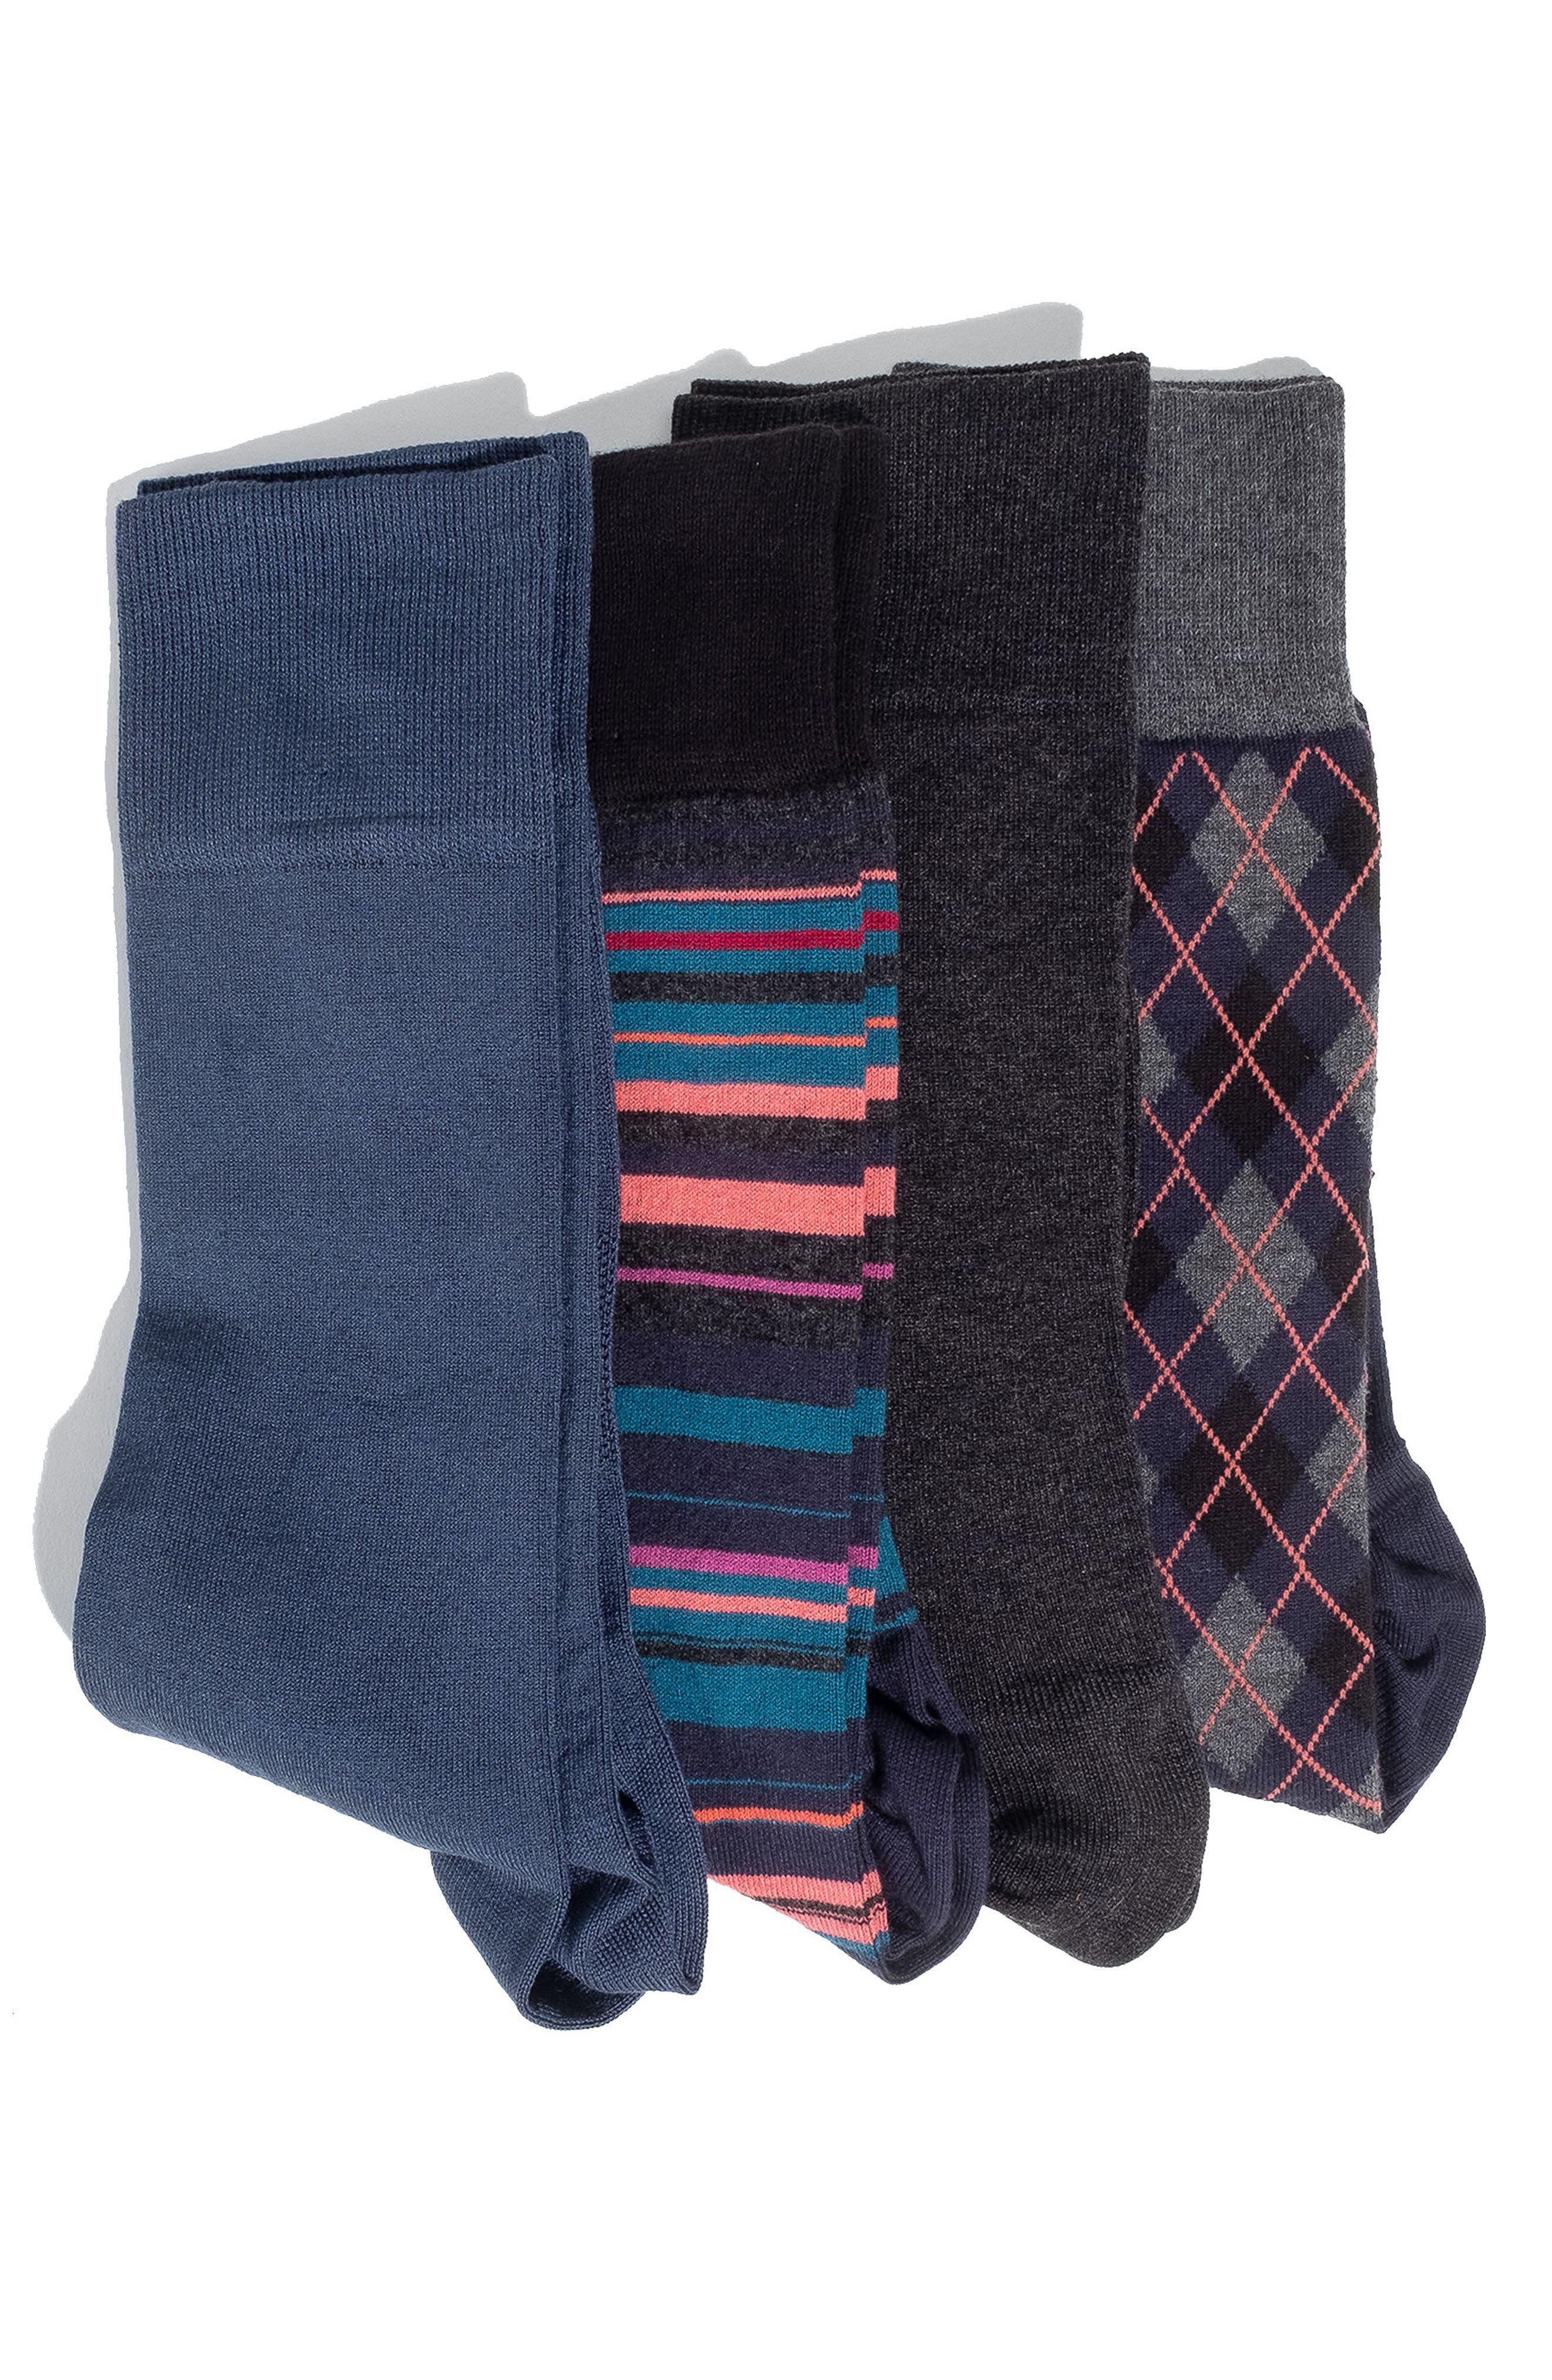 4-Pack Socks,                             Main thumbnail 1, color,                             400